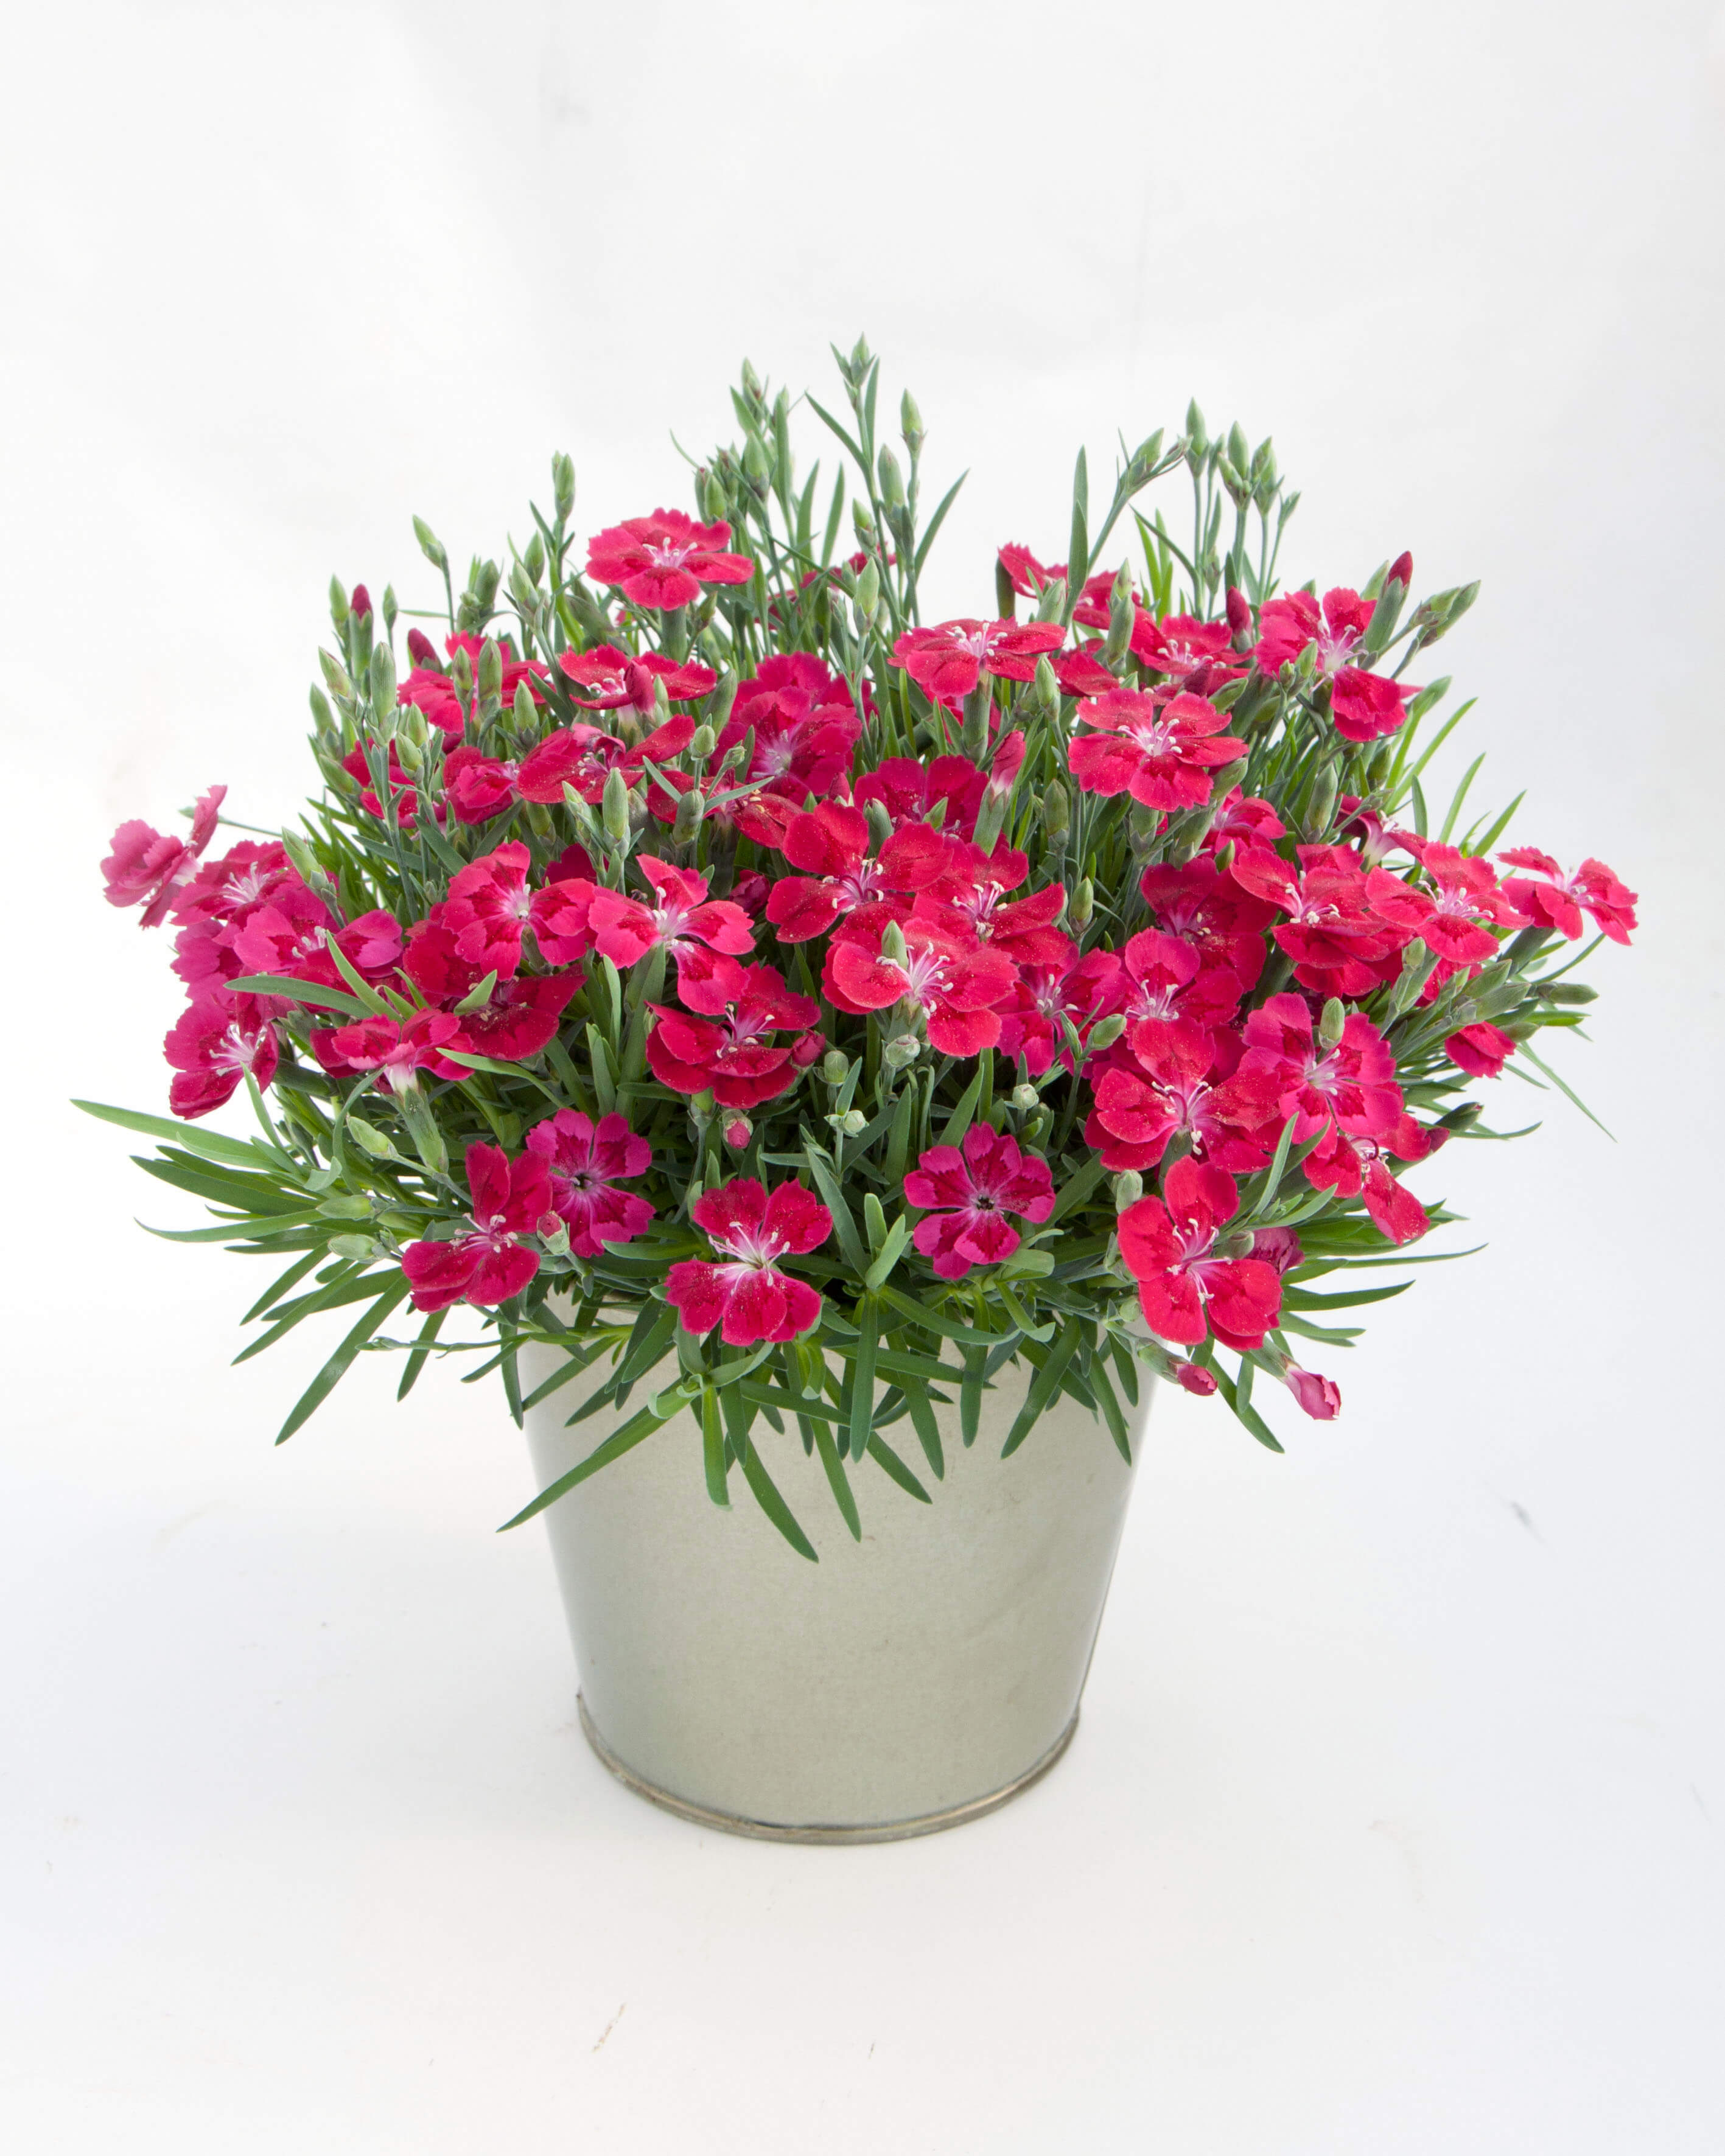 Nelke (Dianthus) T12 Pillow Red - einfachblühend + winterhart